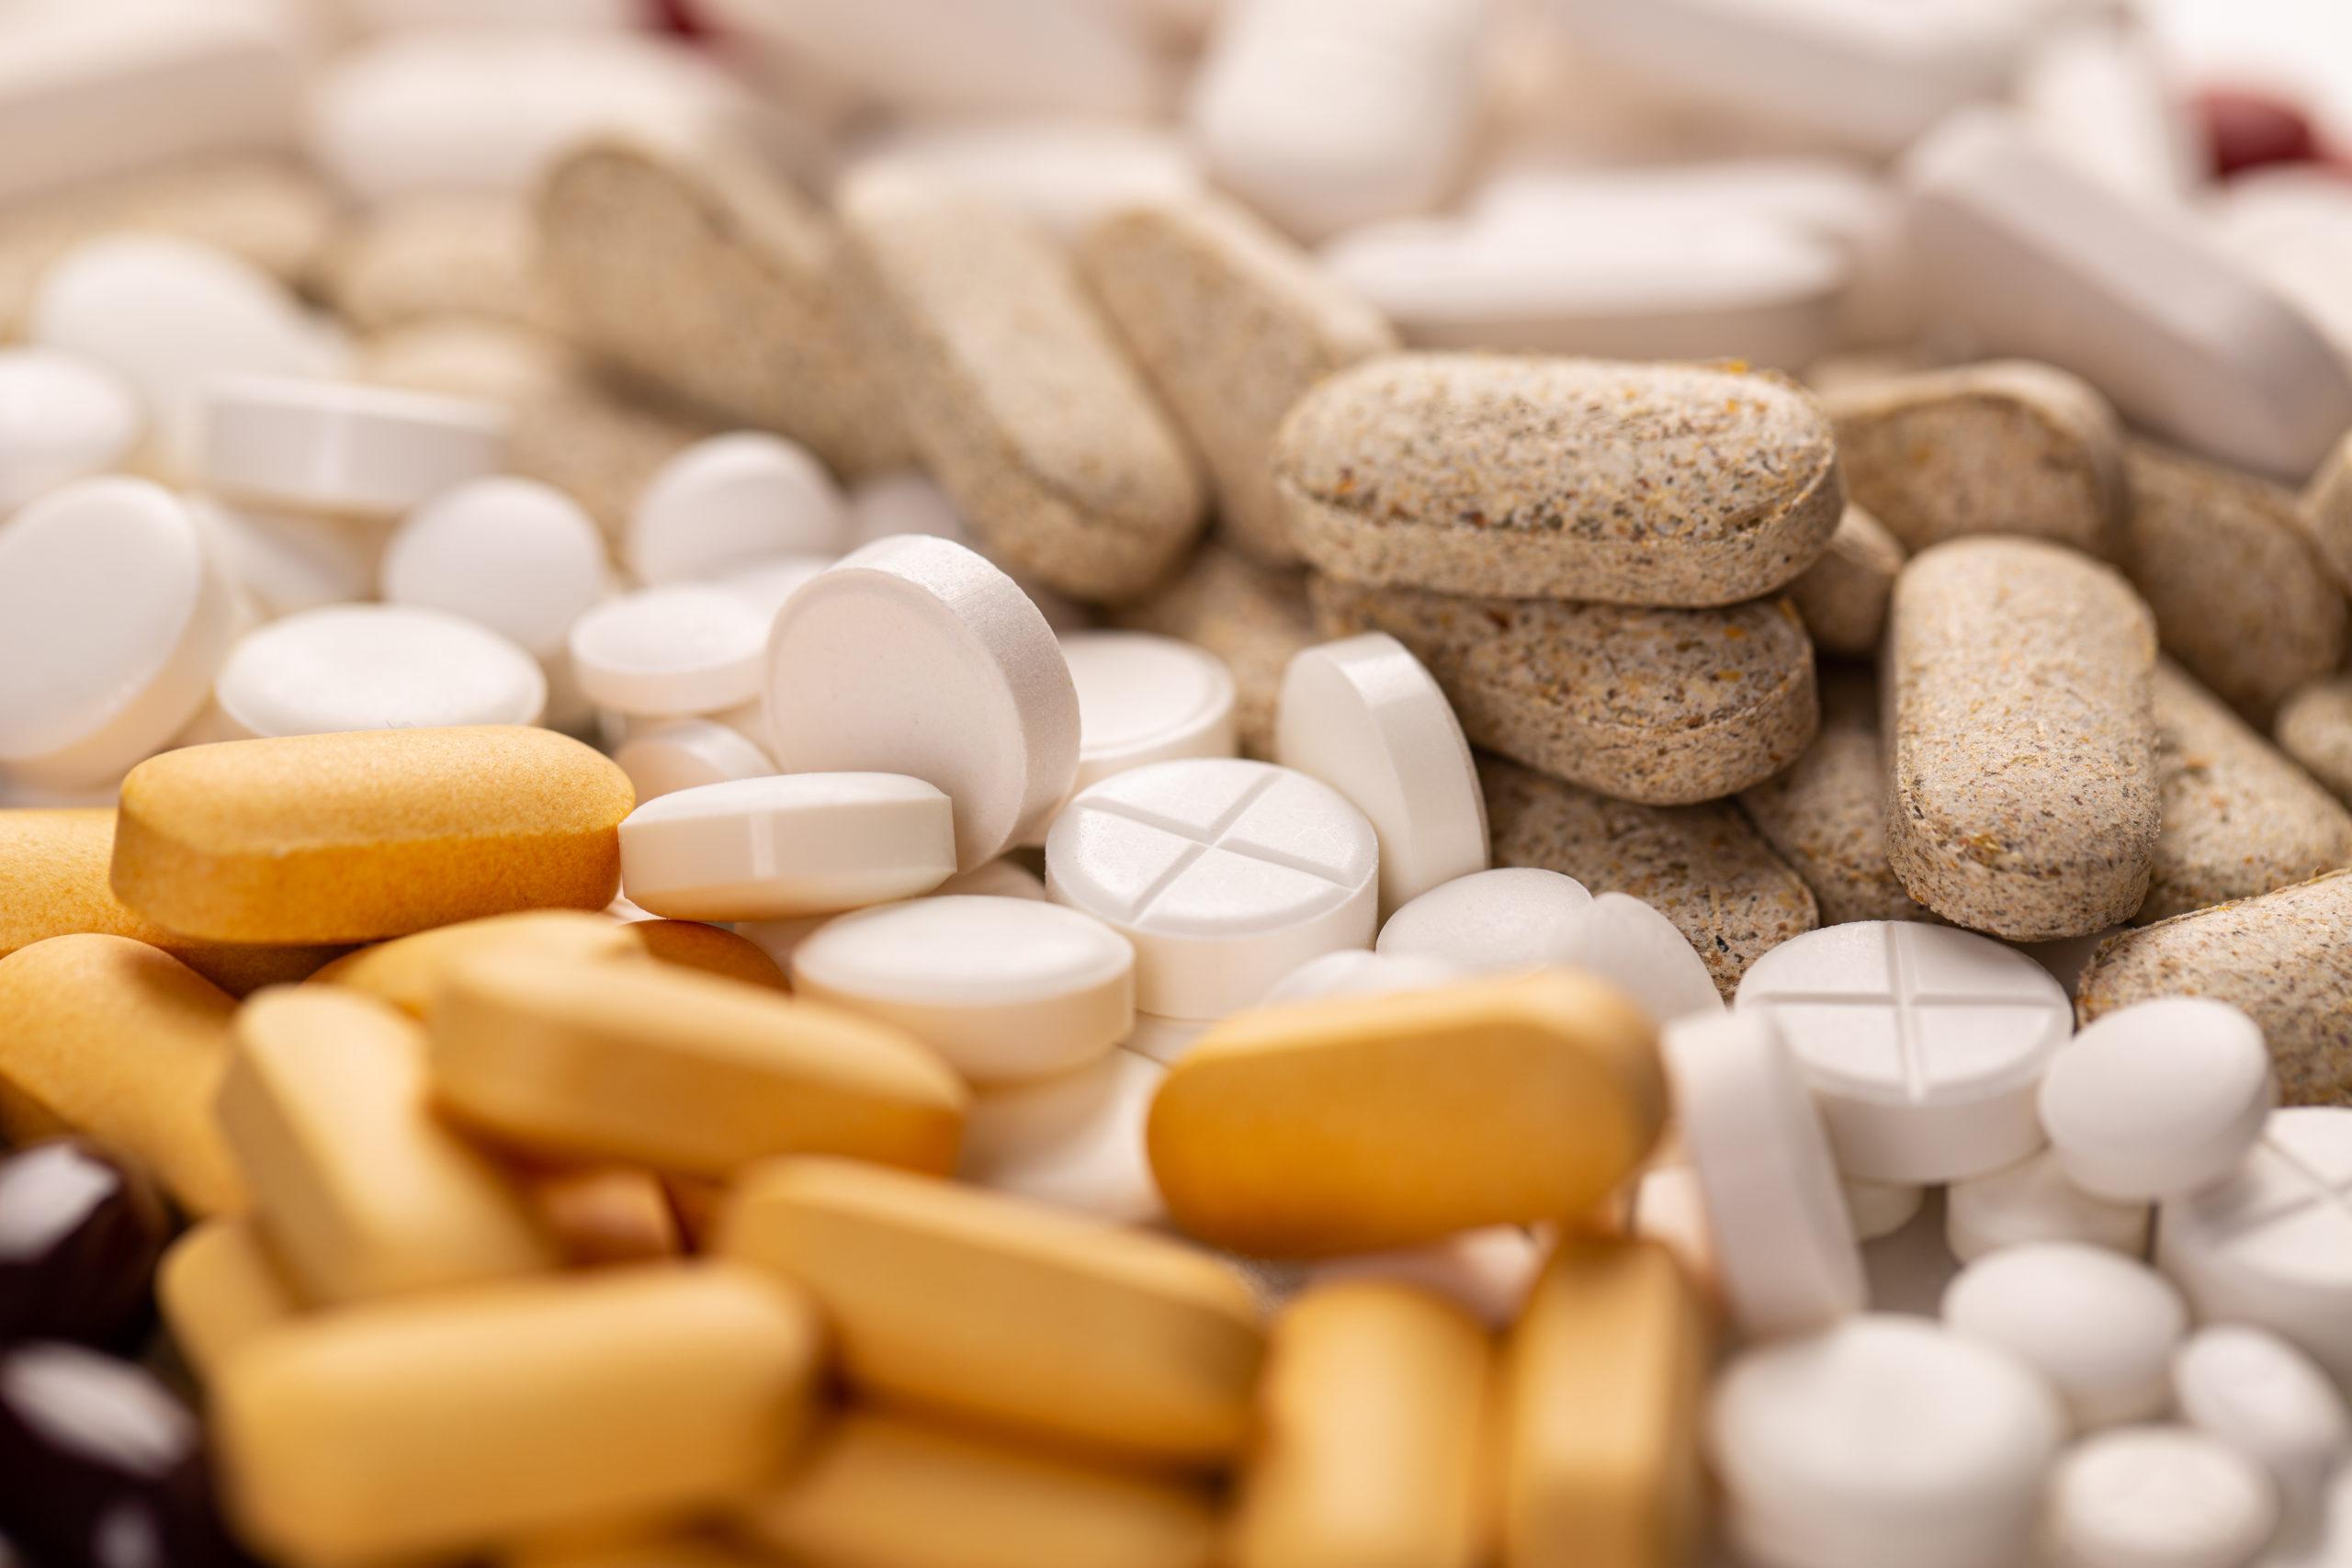 Pharma & Biotech